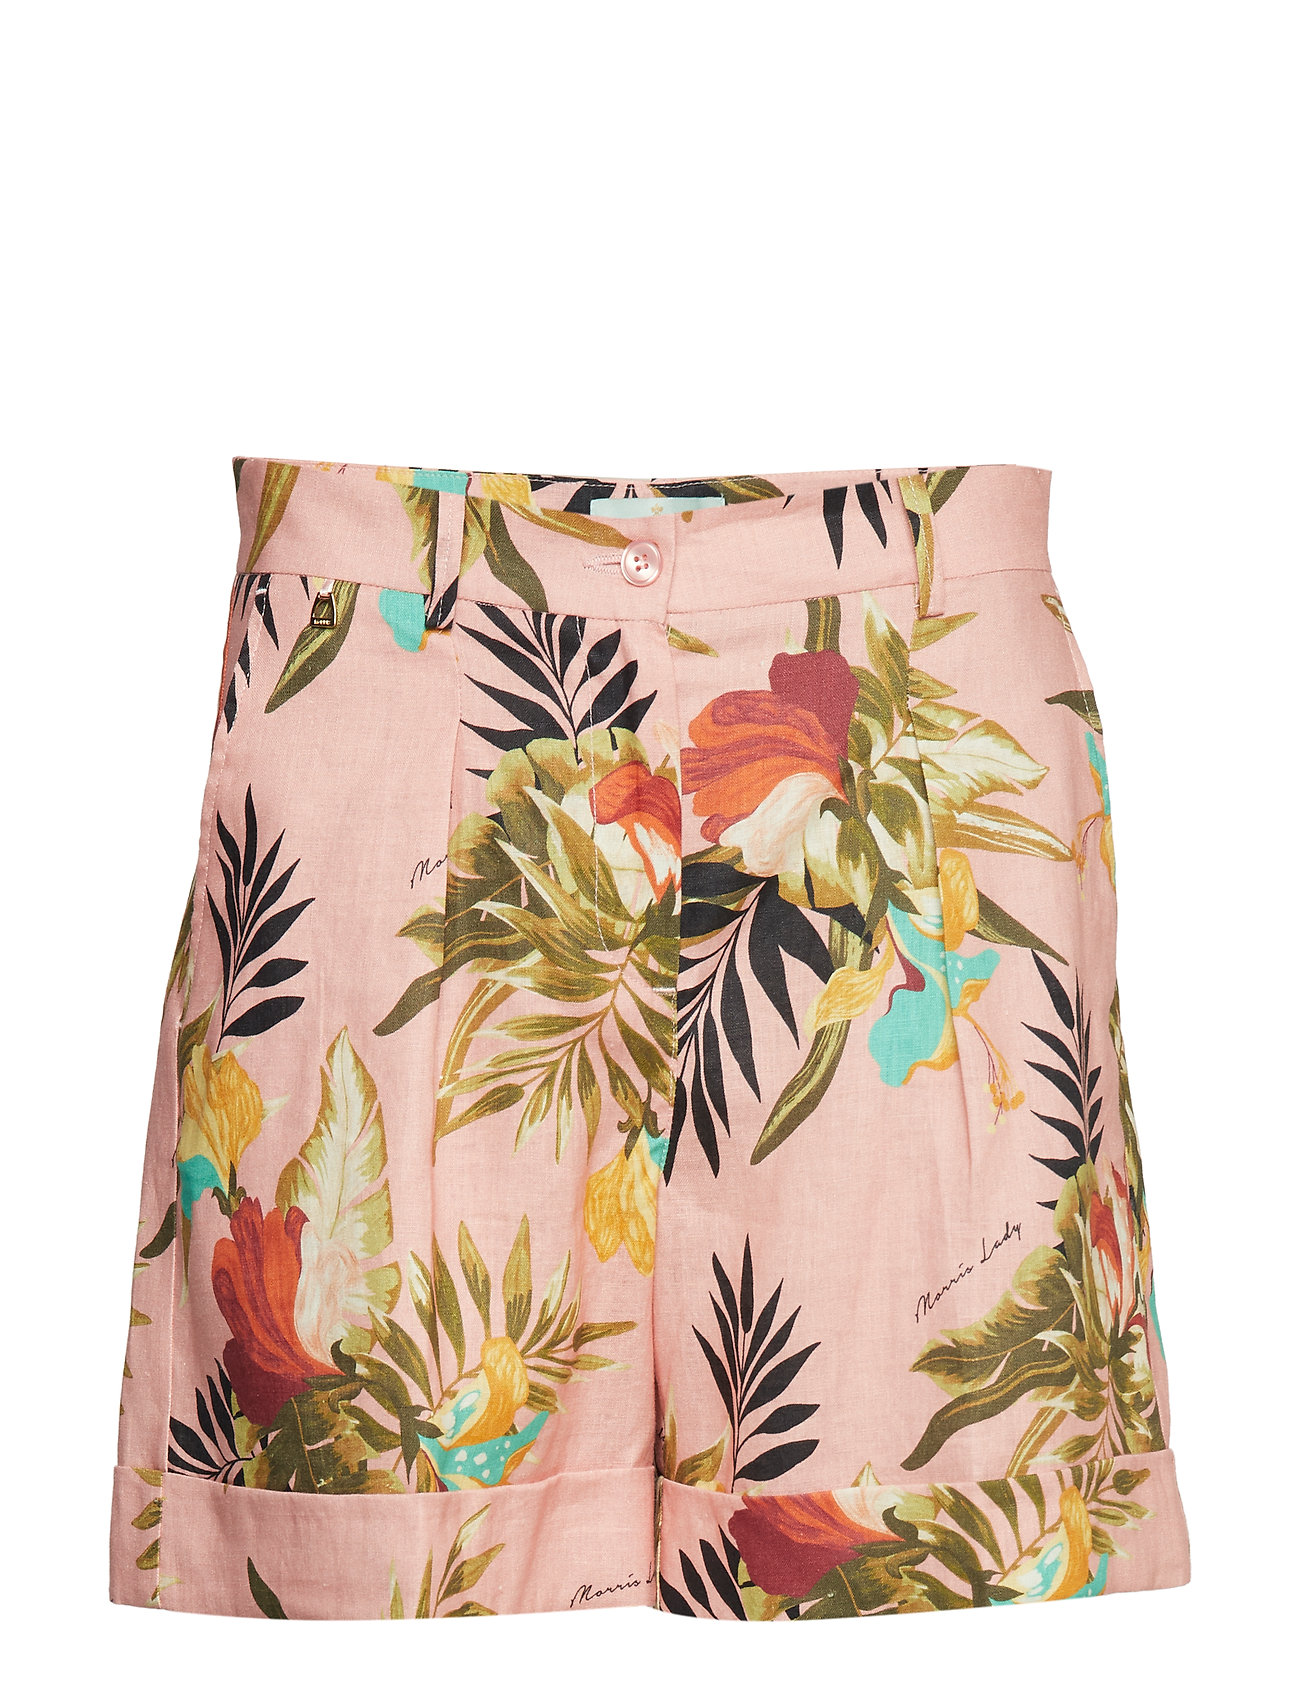 Image of Mara Printed Linen Shorts Shorts Flowy Shorts/Casual Shorts Multi/mønstret MORRIS LADY (3168379097)